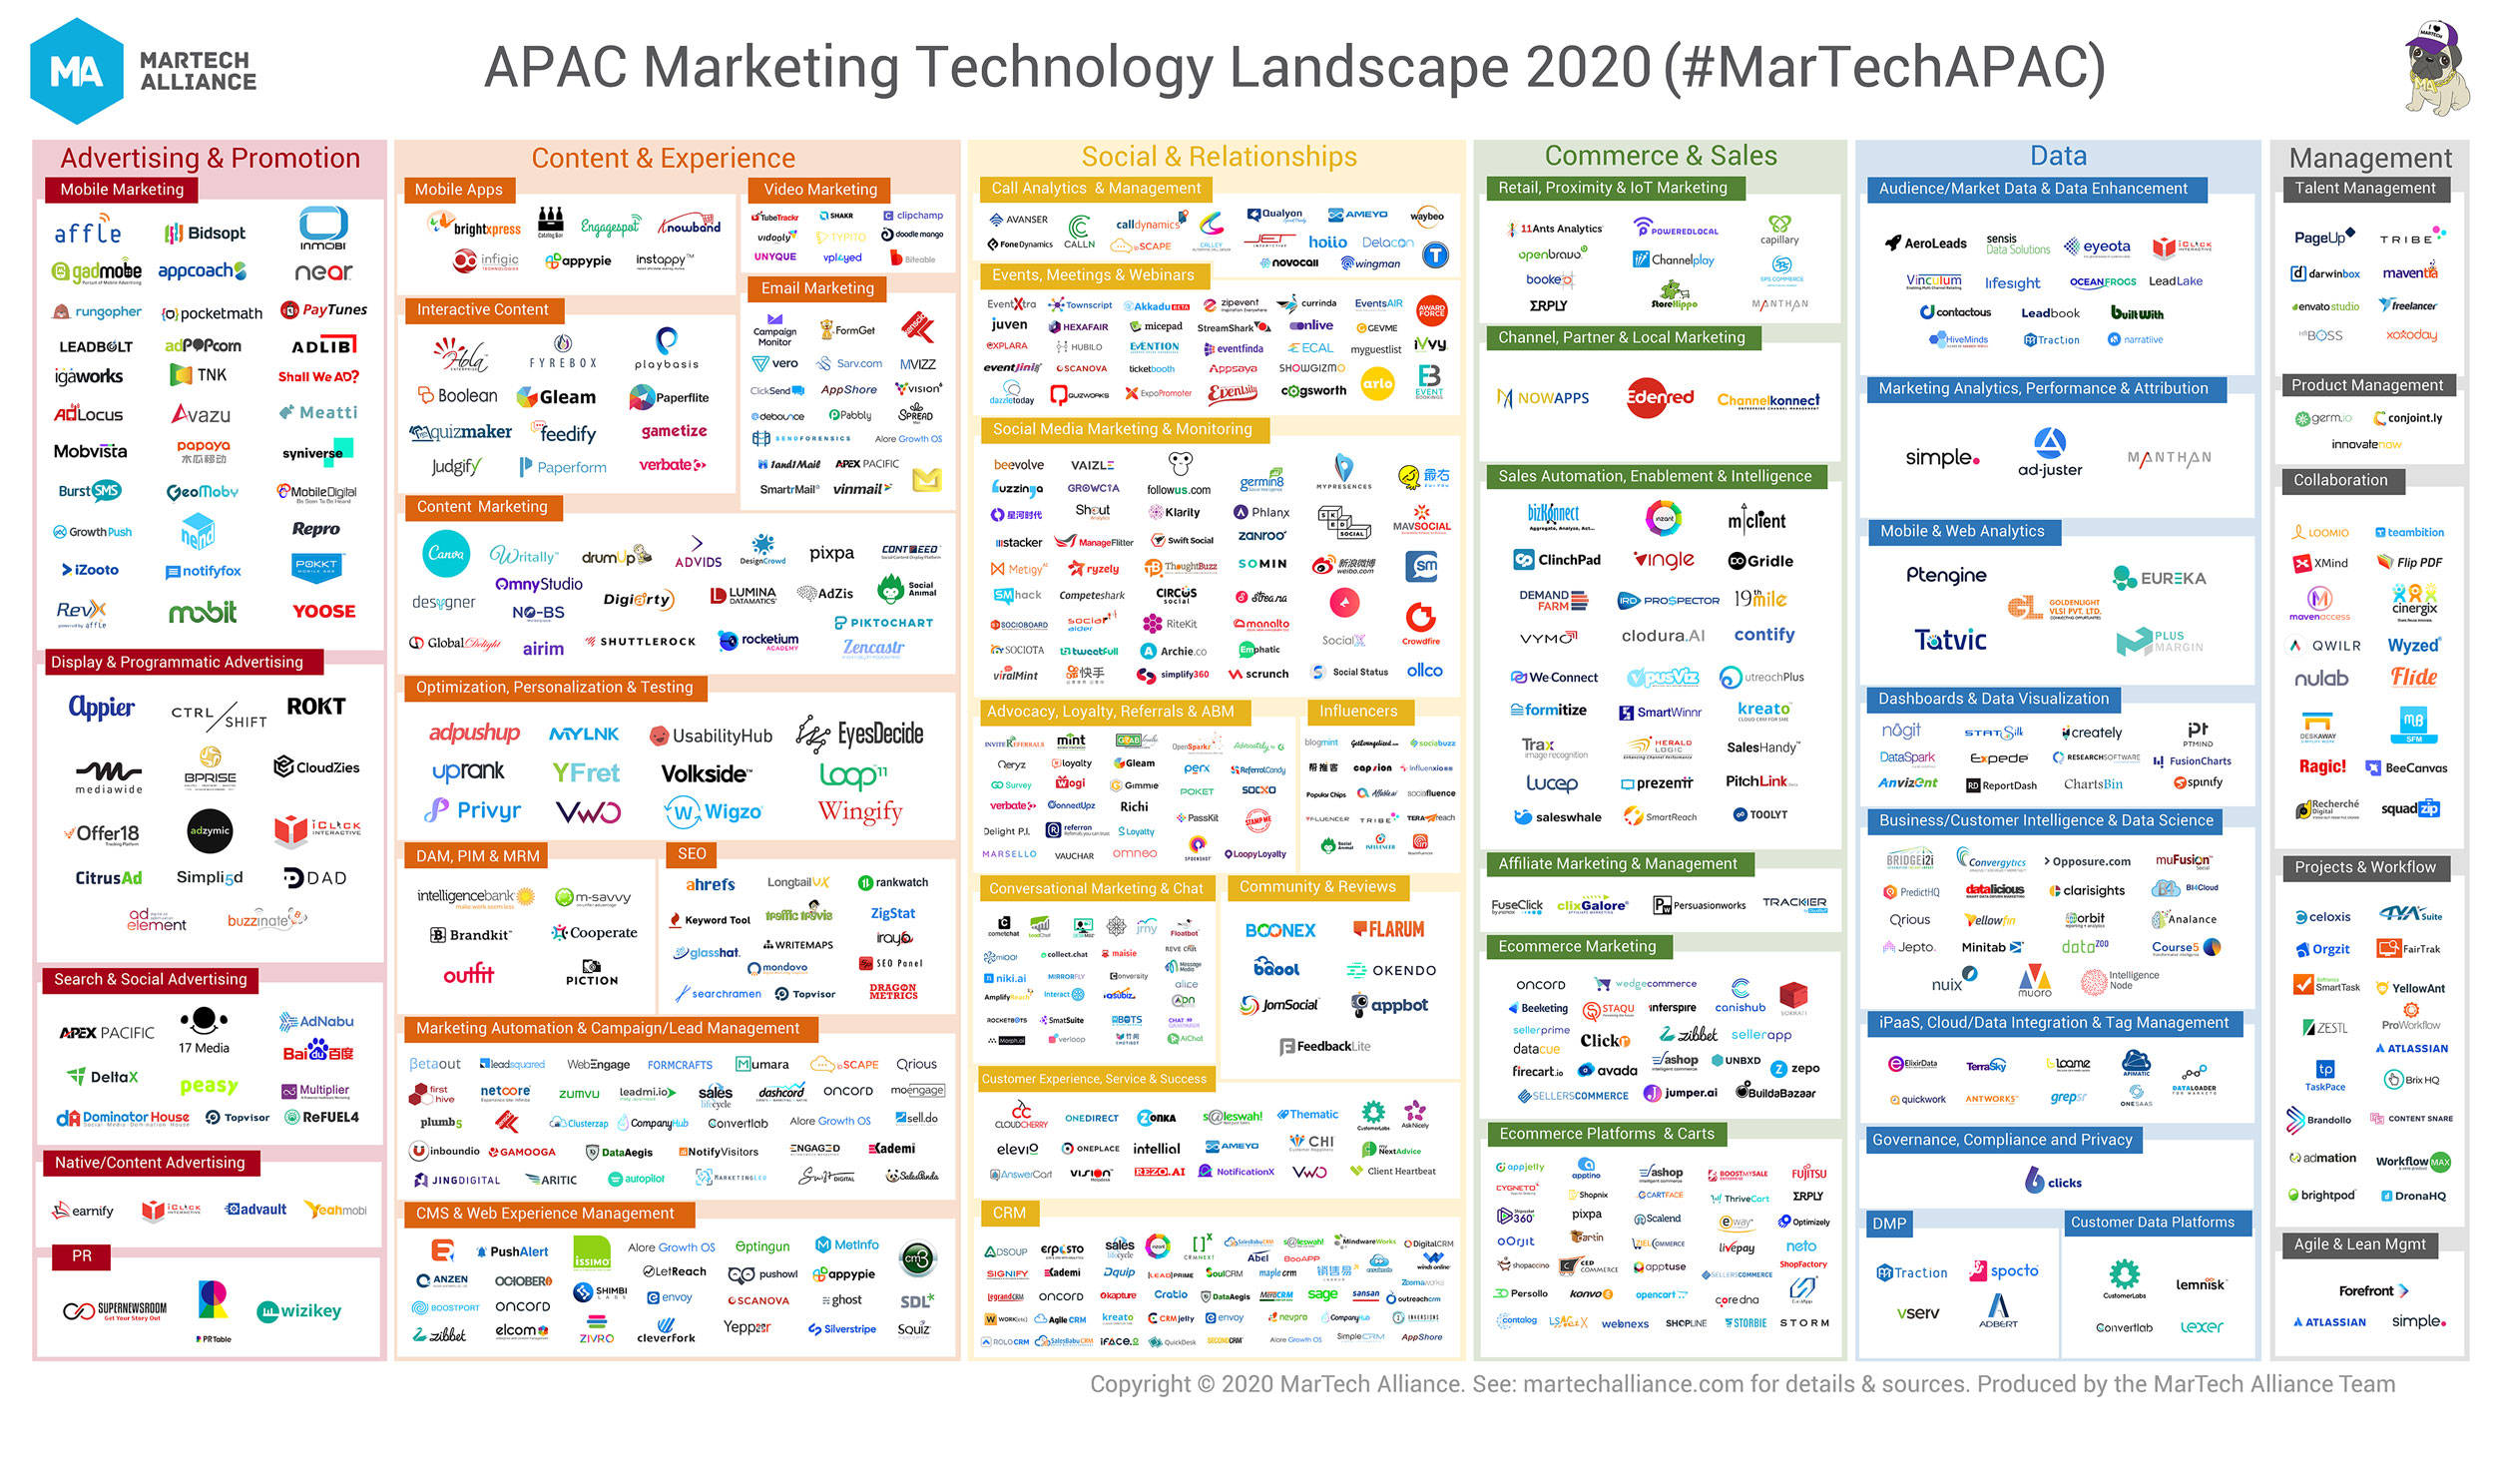 APAC Marketing Technology Landscape 2020 final